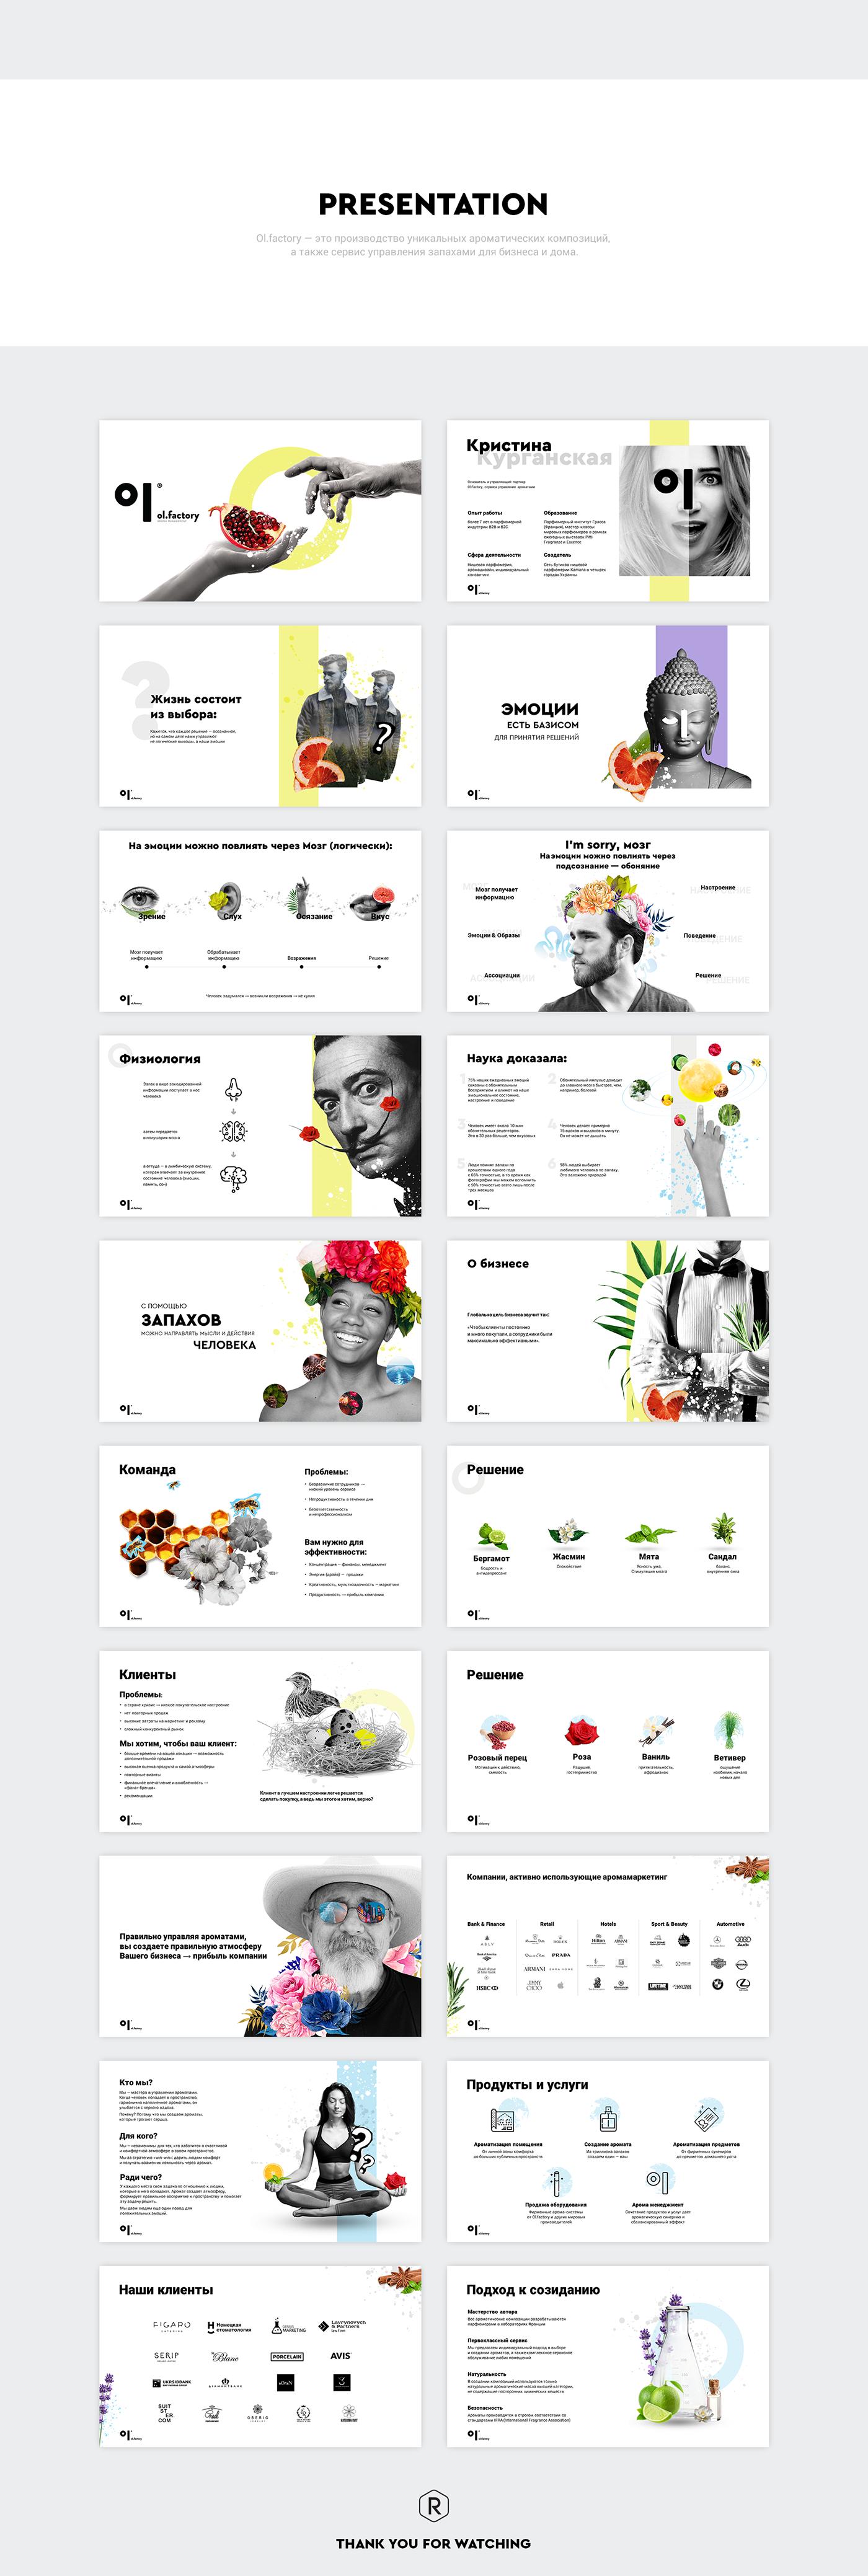 Presetation Aroma Powerpoint morph office 365